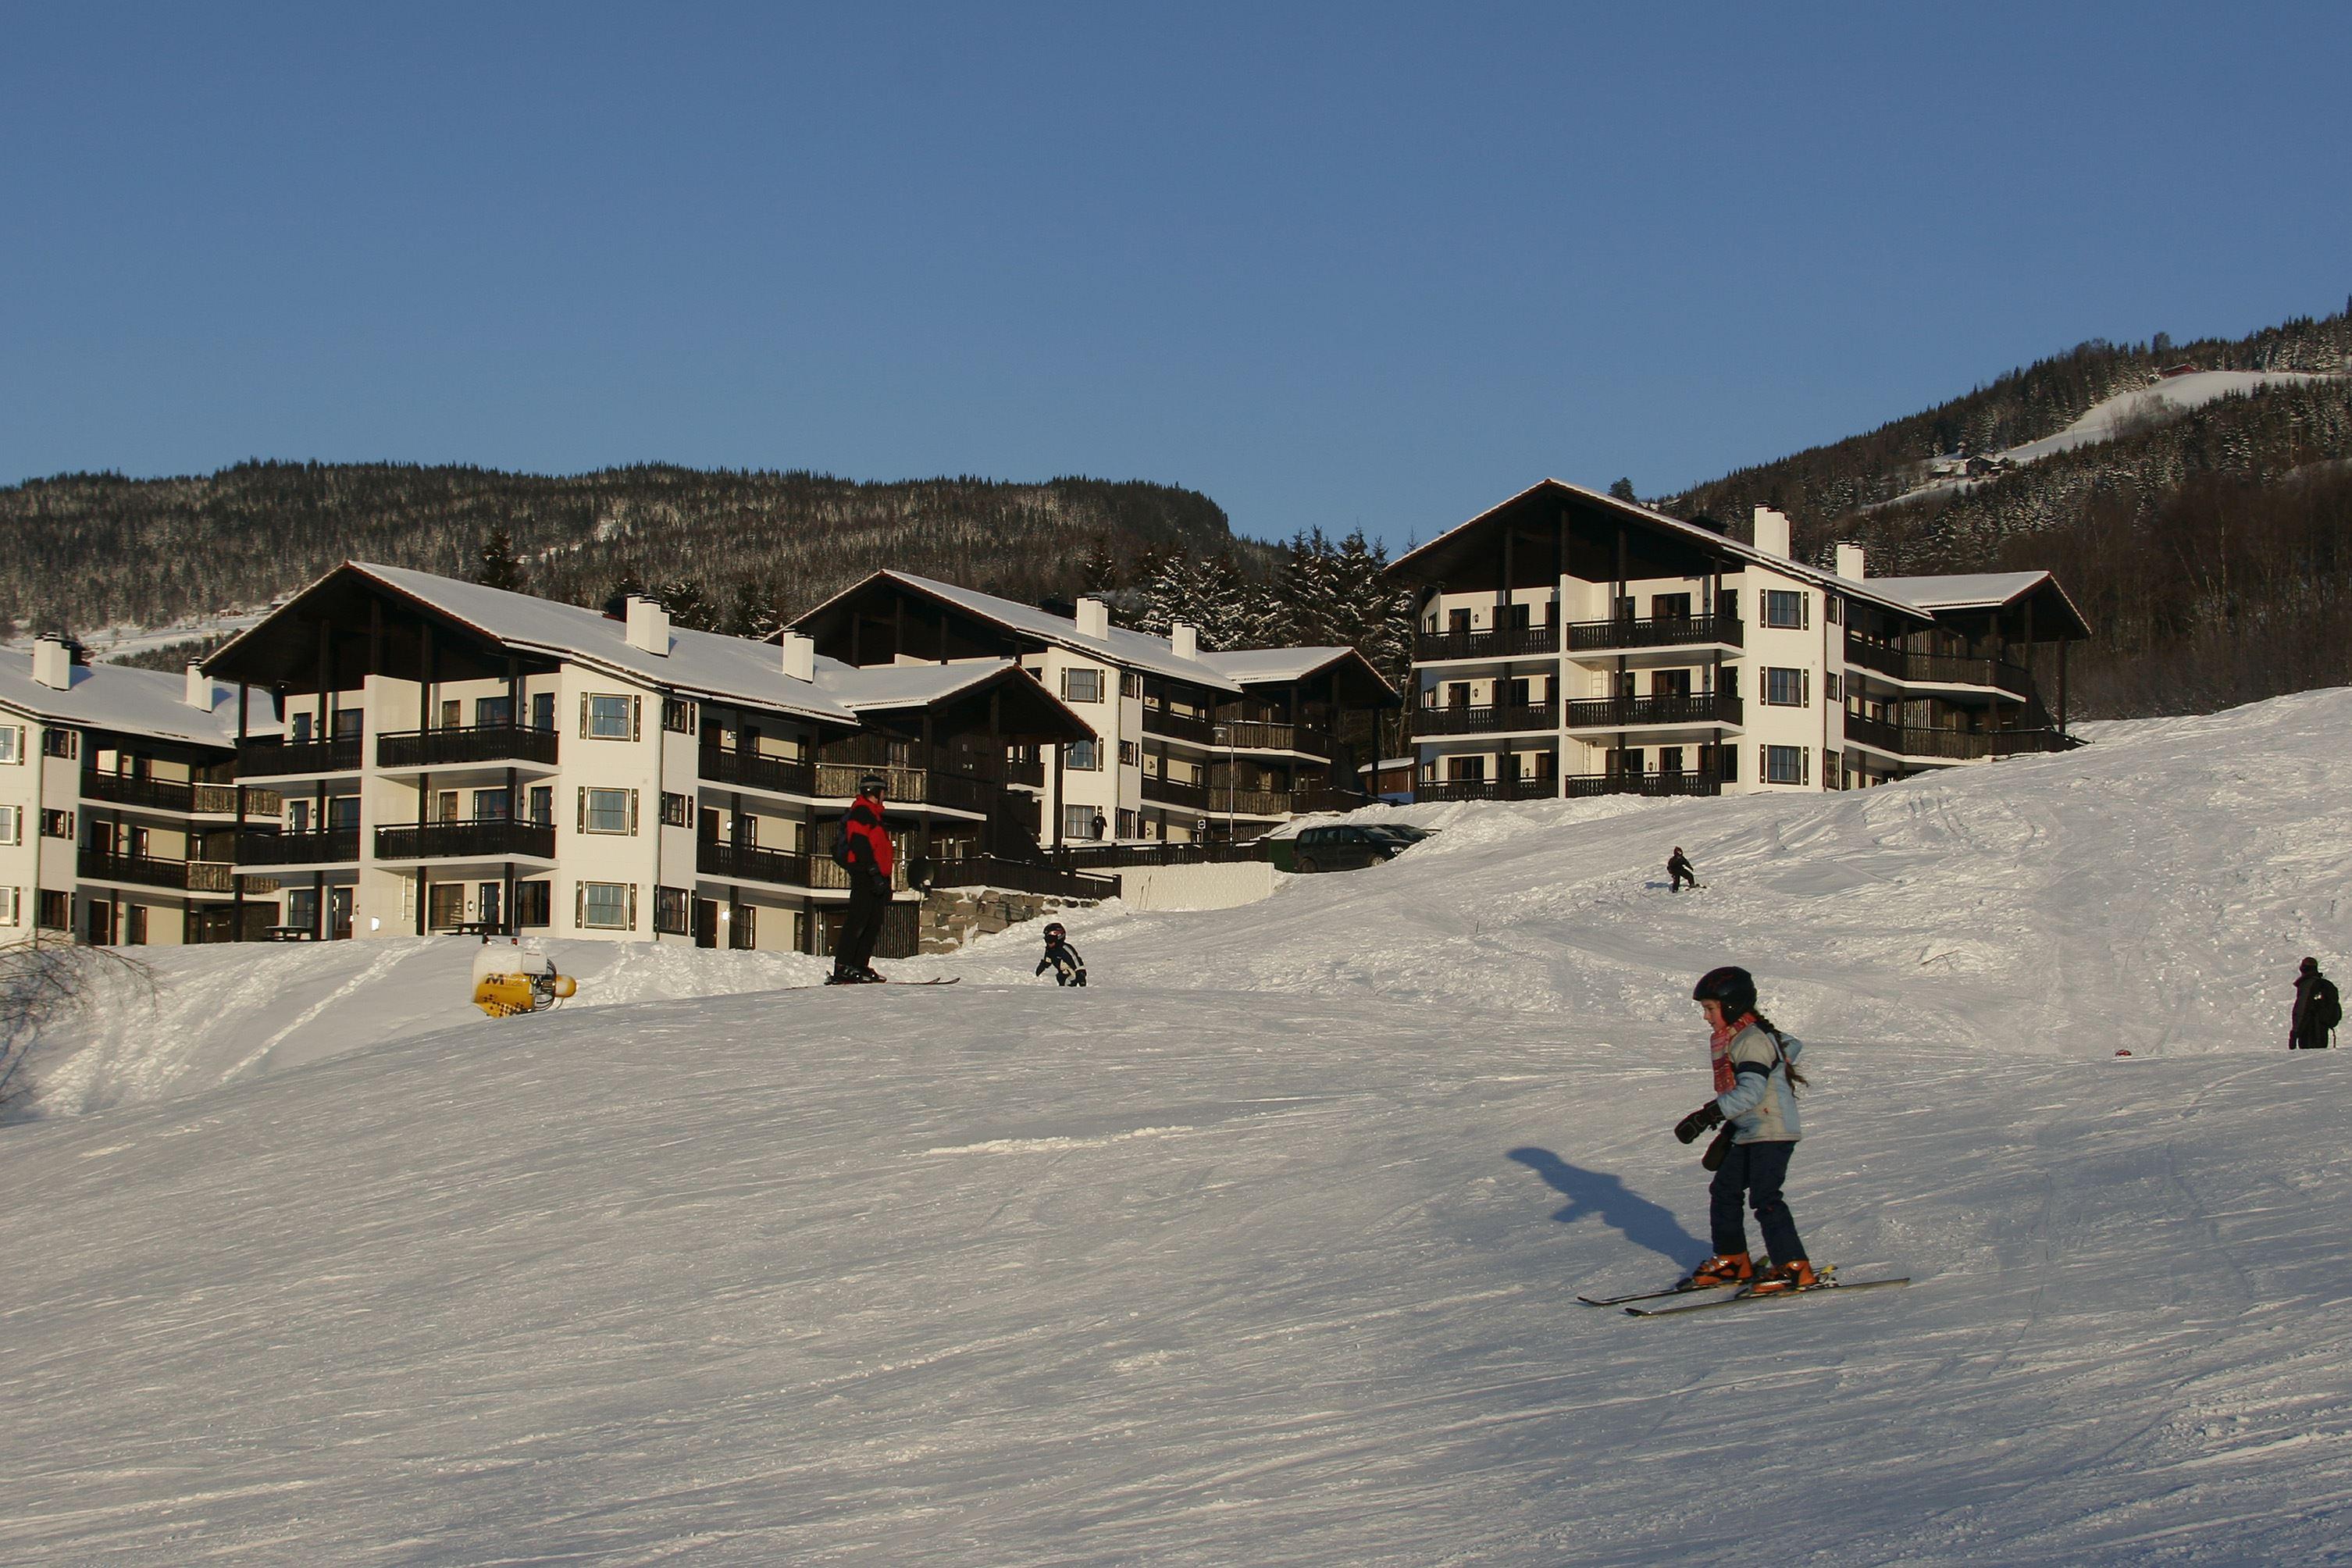 STIHL TIMBERSPORTS World Championship in Lillehammer Norway